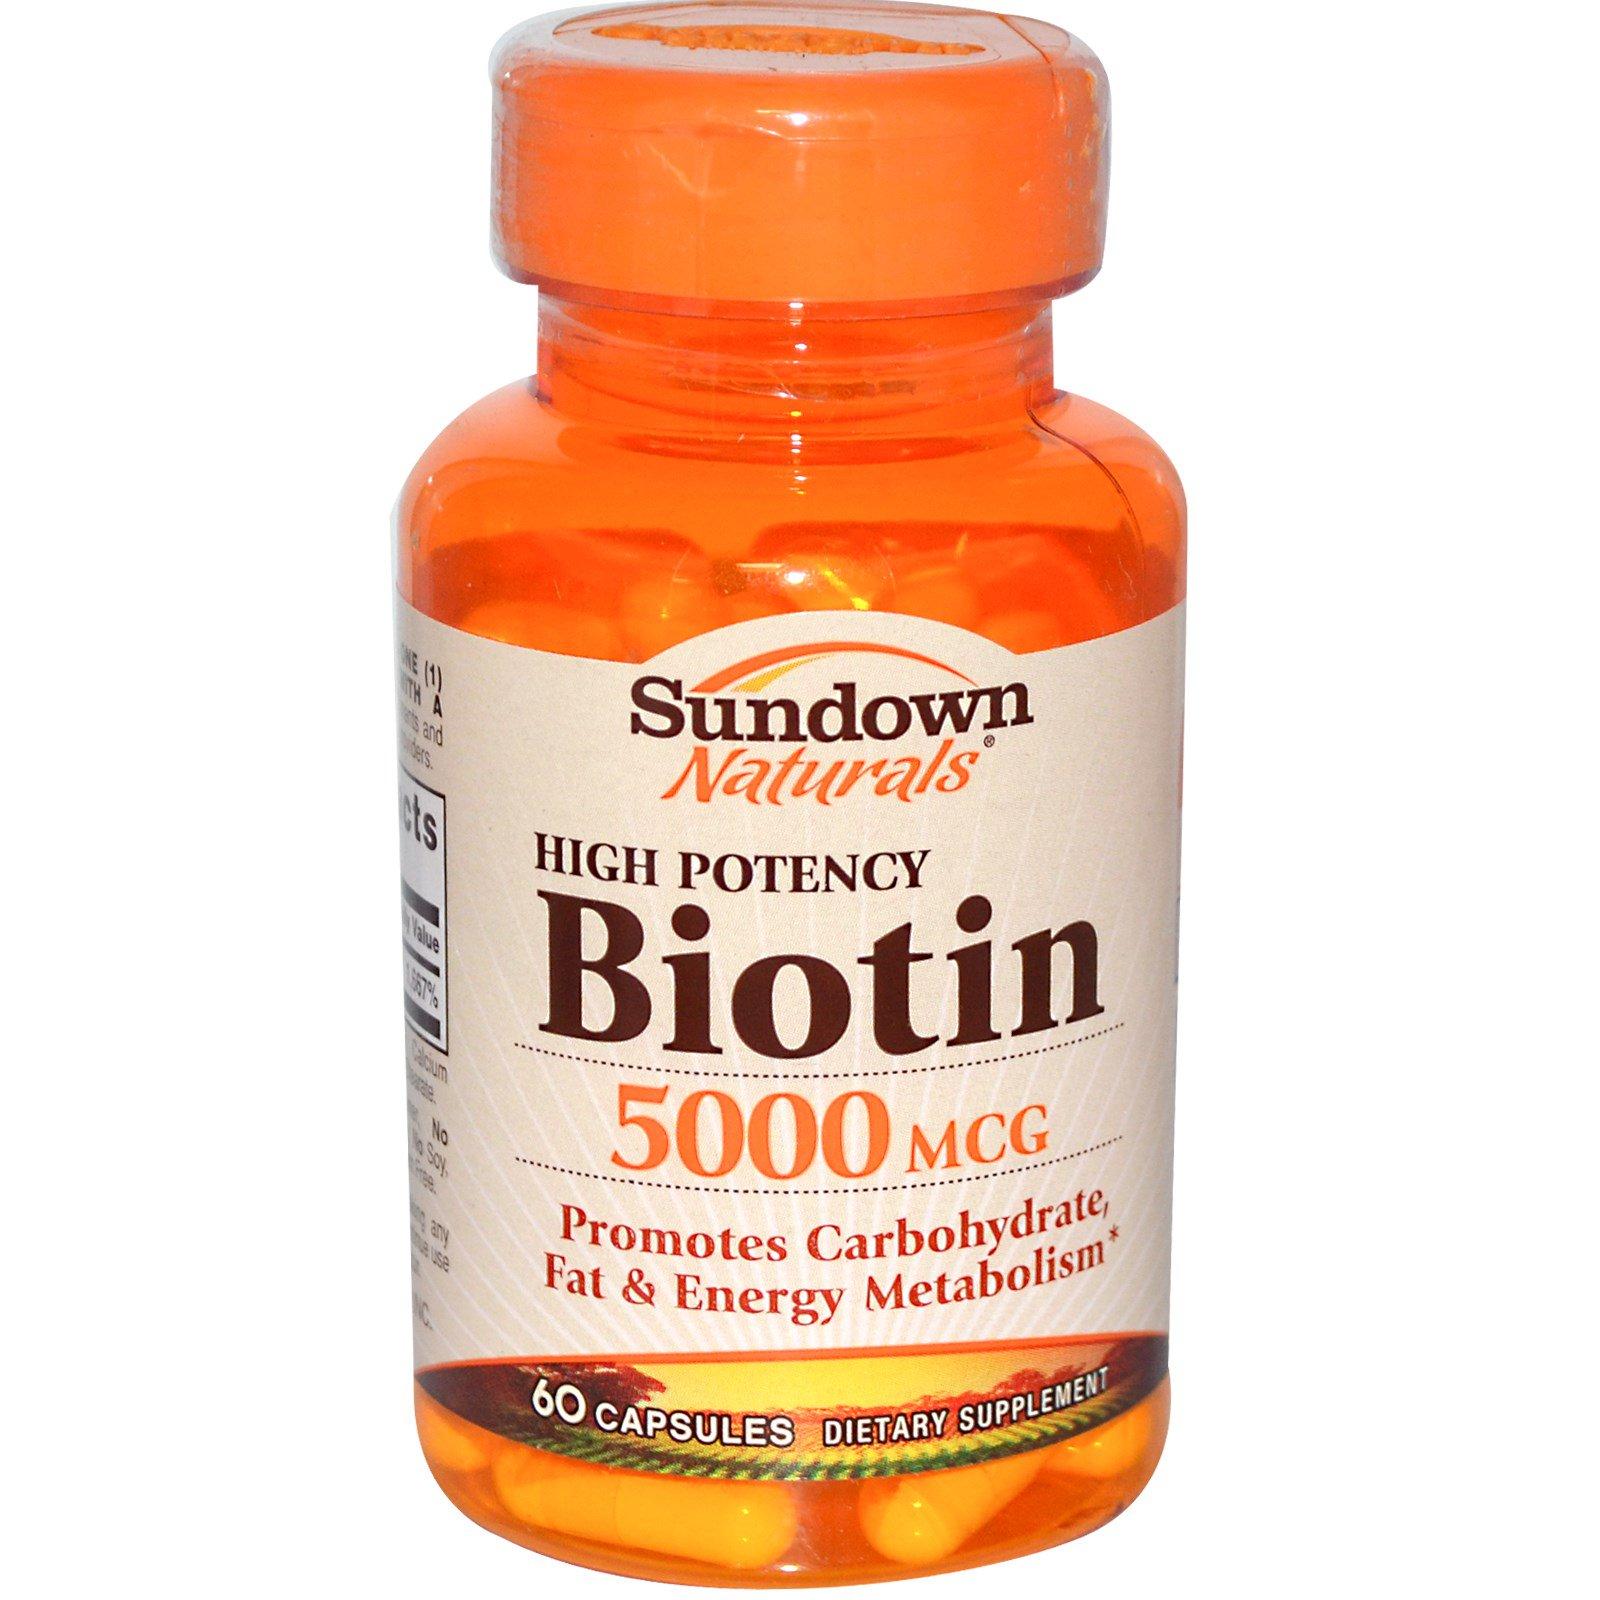 Sundown Naturals High Potency Biotin  Mcg Reviews